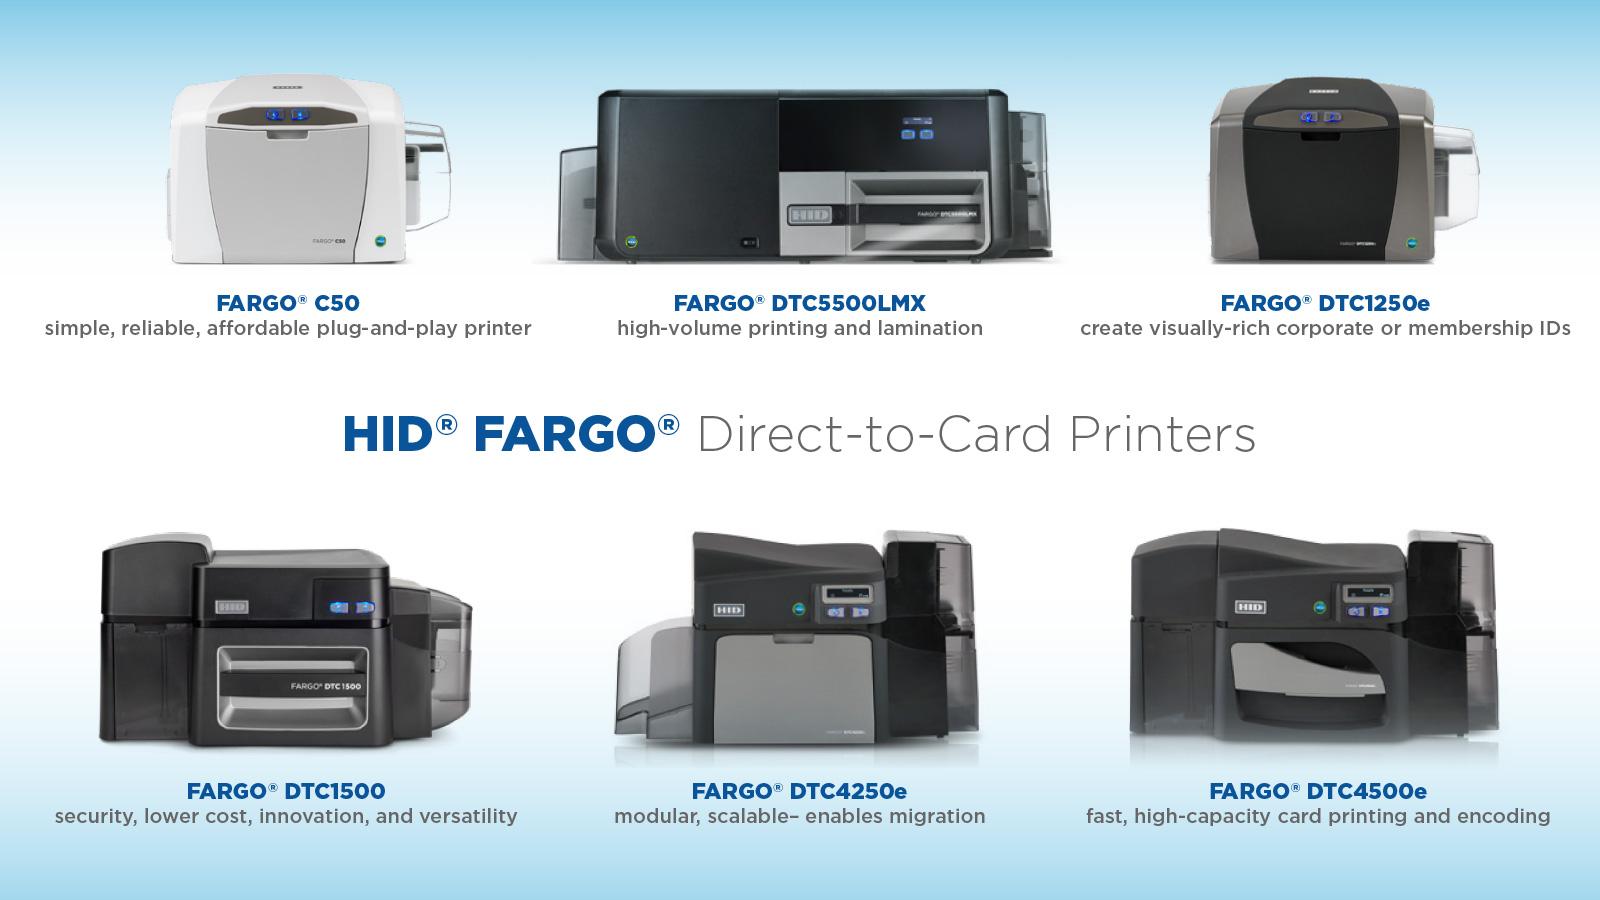 Fargo ID Card Printers DTC Series